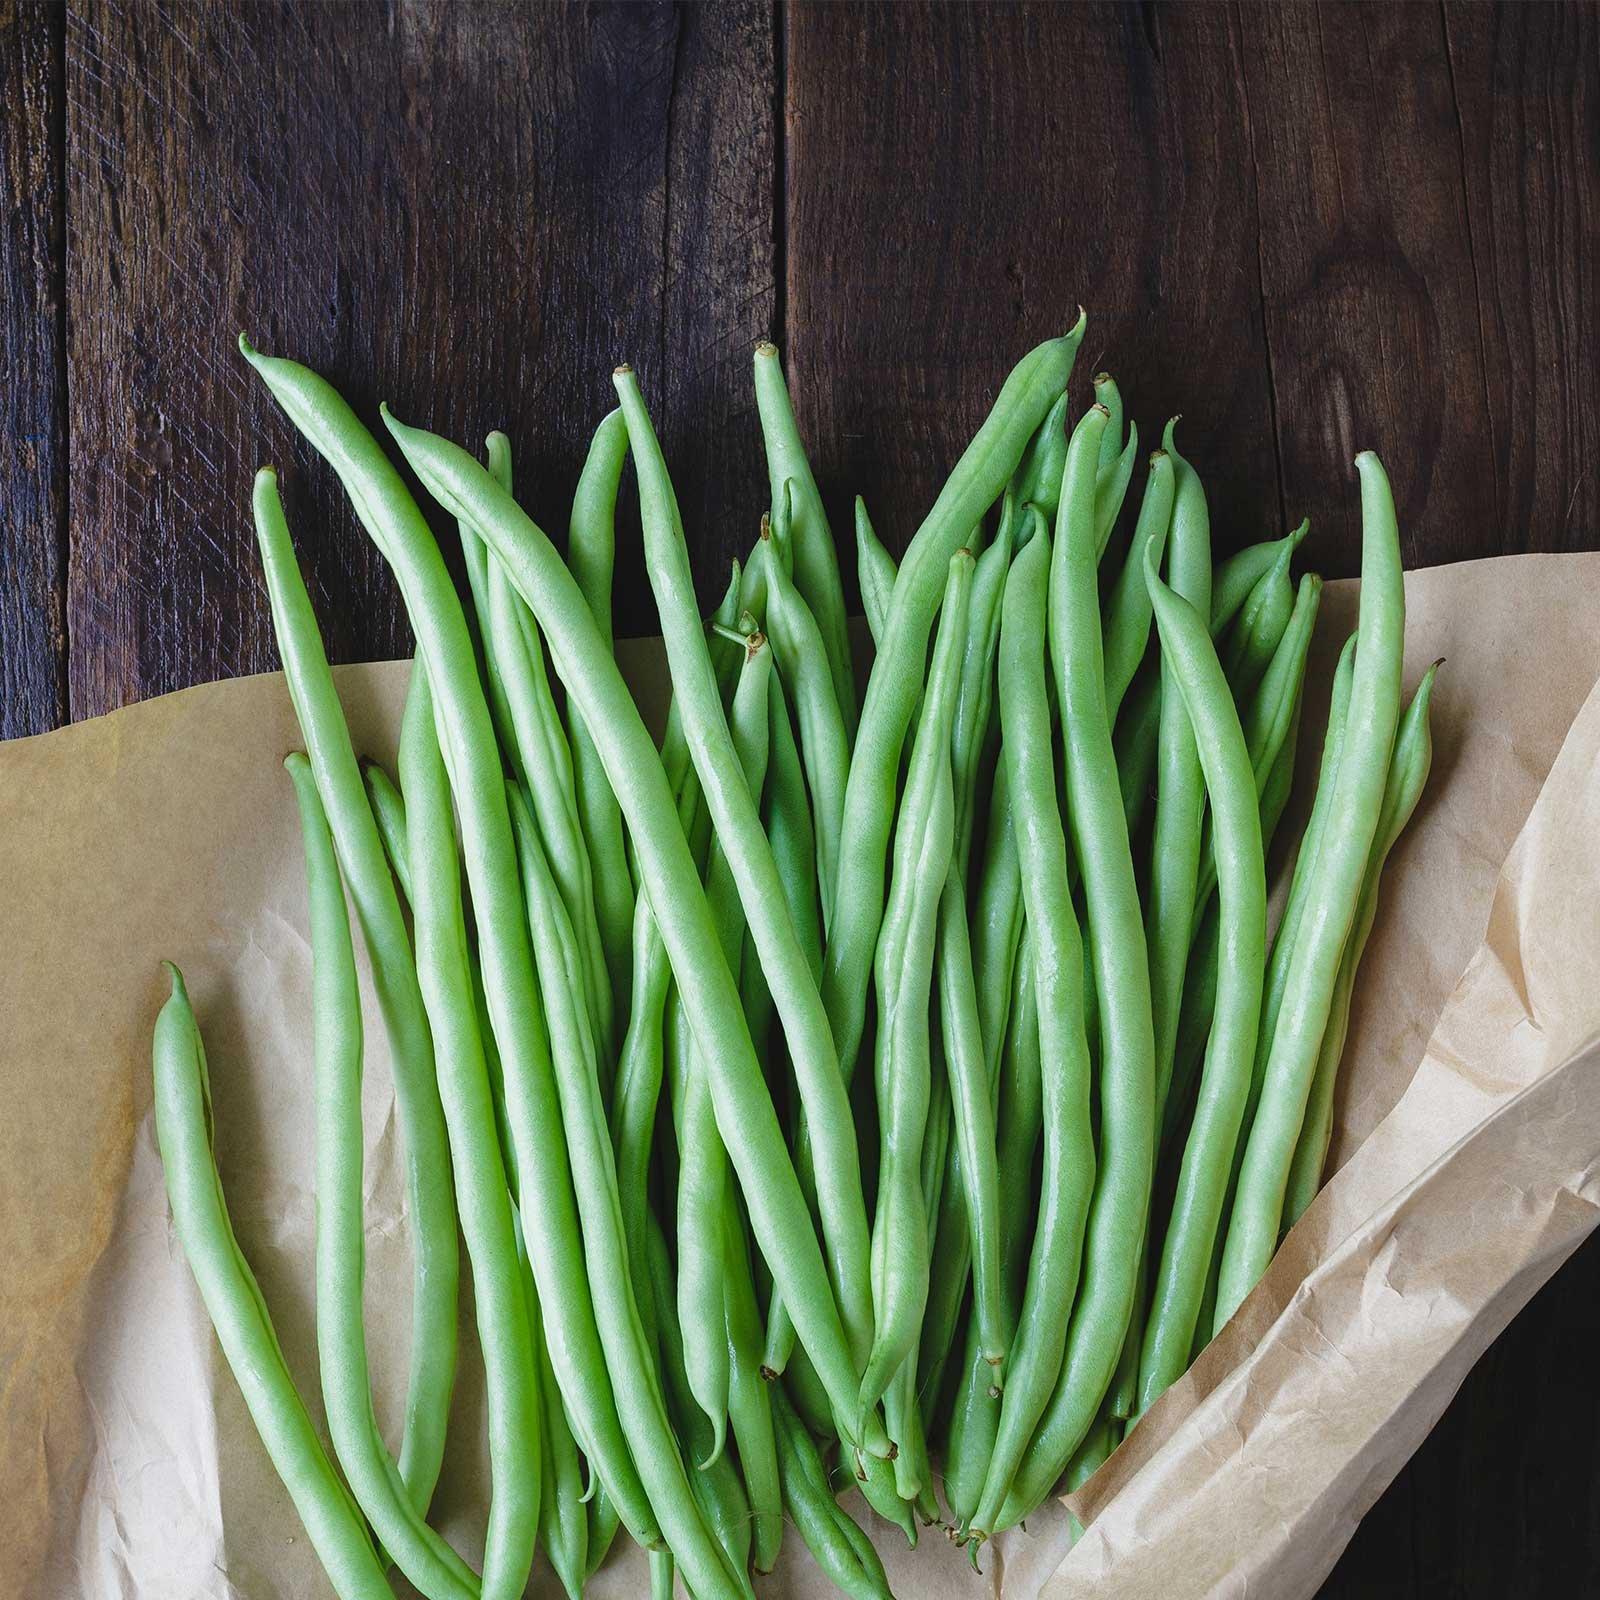 Blue Lake Bush Bean 274 Seeds - 5 Lbs - Non-GMO, Heirloom, Open Pollinated - Vegetable Garden Seeds - Green String Beans